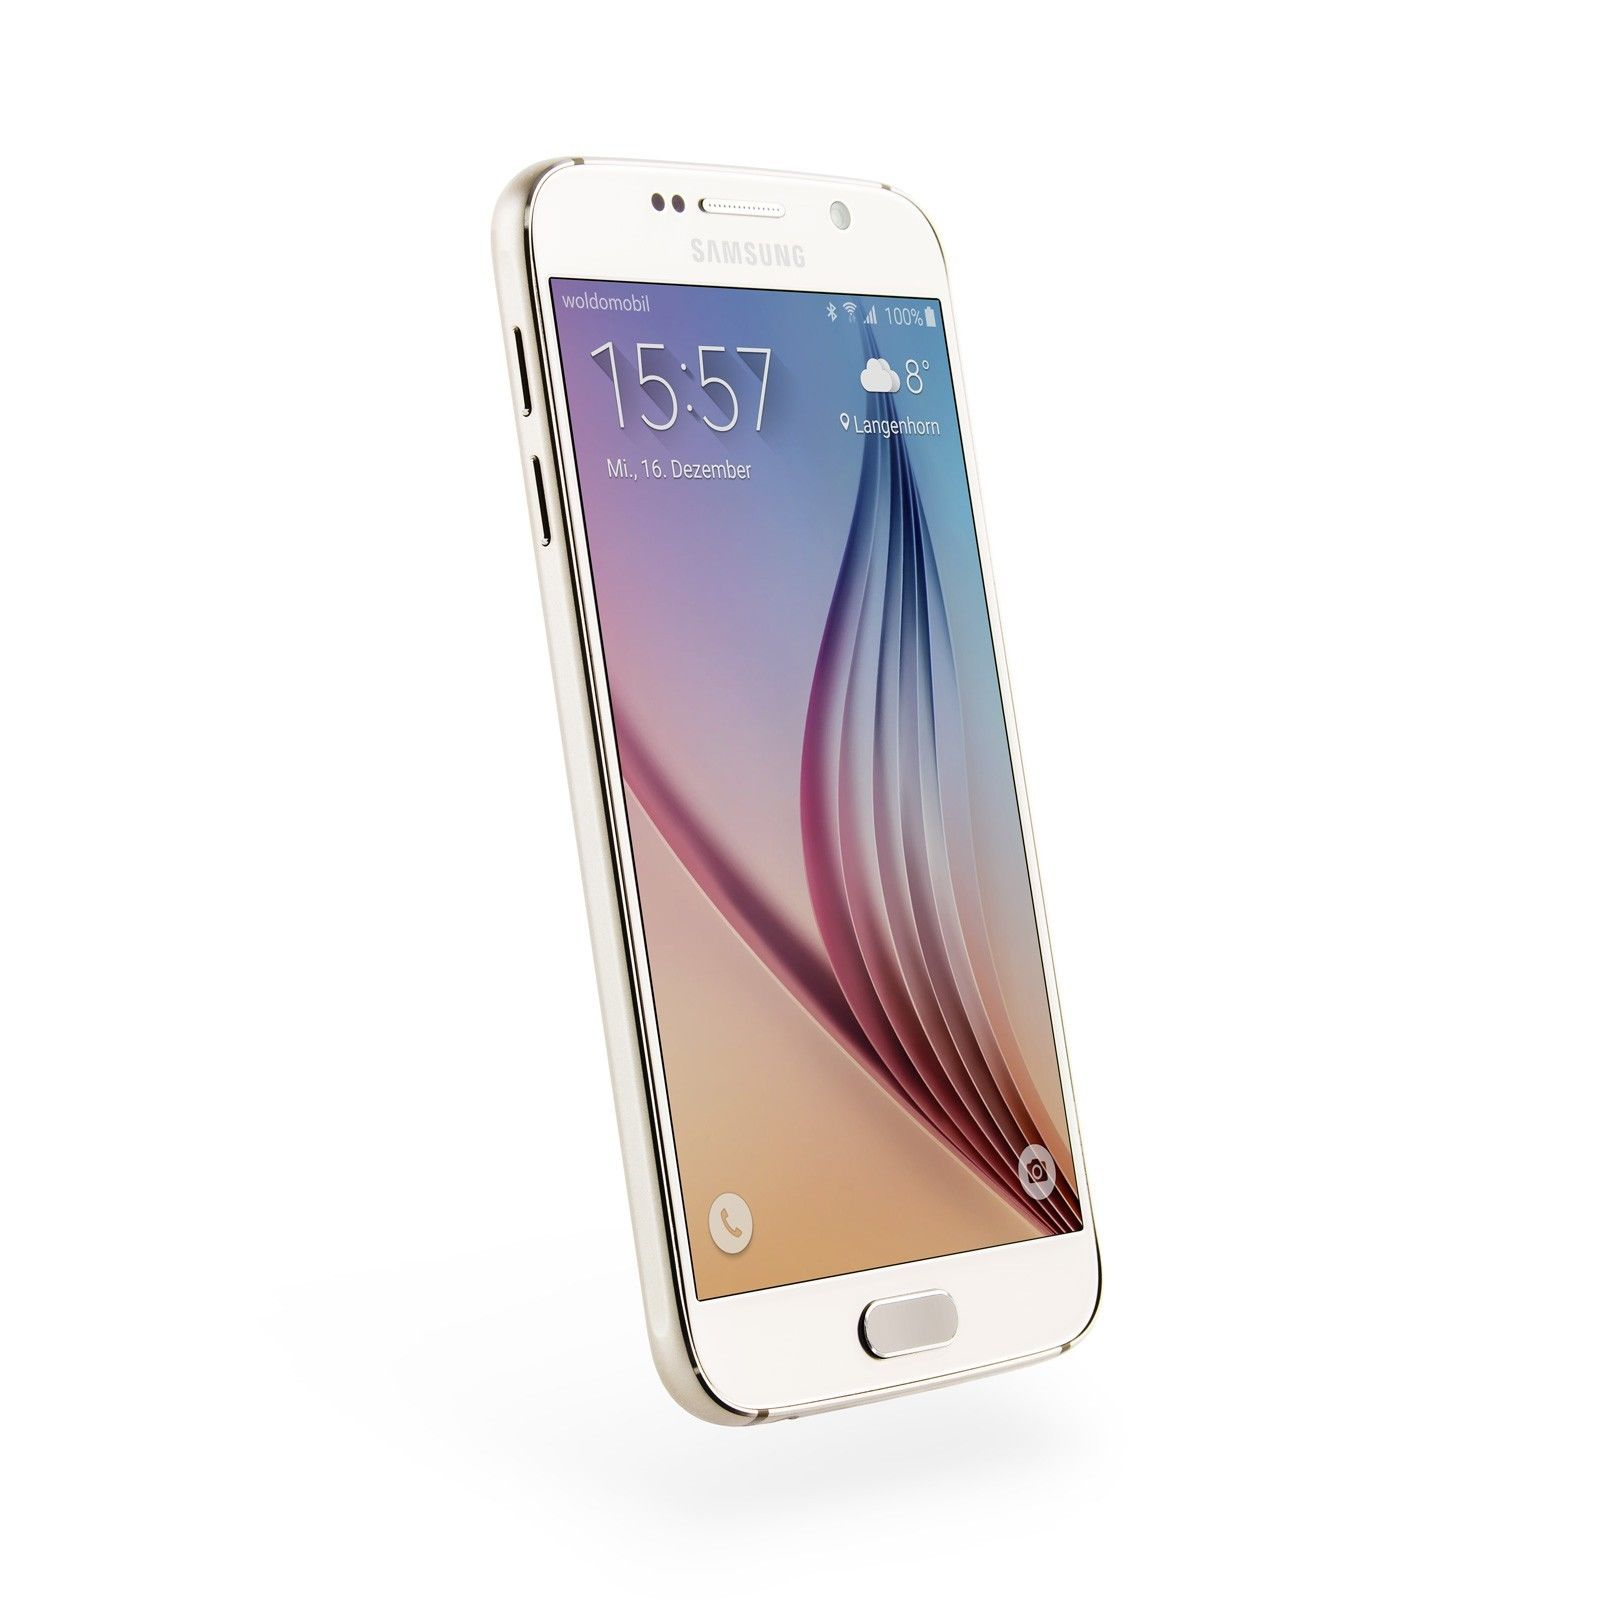 Samsung Galaxy S6 SM-G920F 32GB Gold Ohne Simlock Gold Platinum Wie Neu